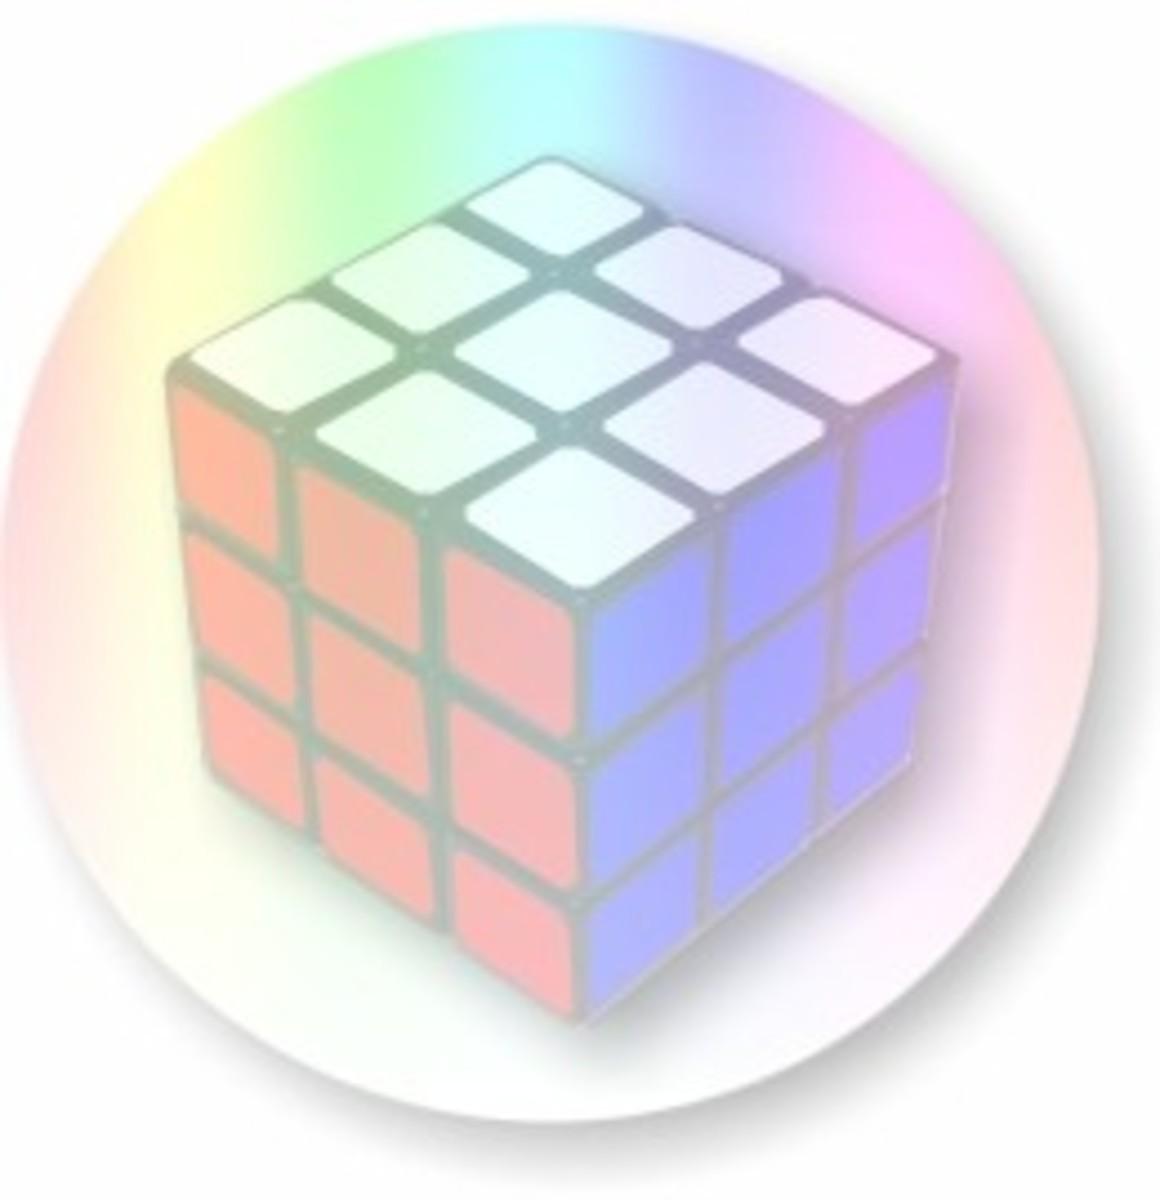 How To Solve A 3x3x3 Rubiks Cube - Standard Cube - 3x3 Rubik's Cube